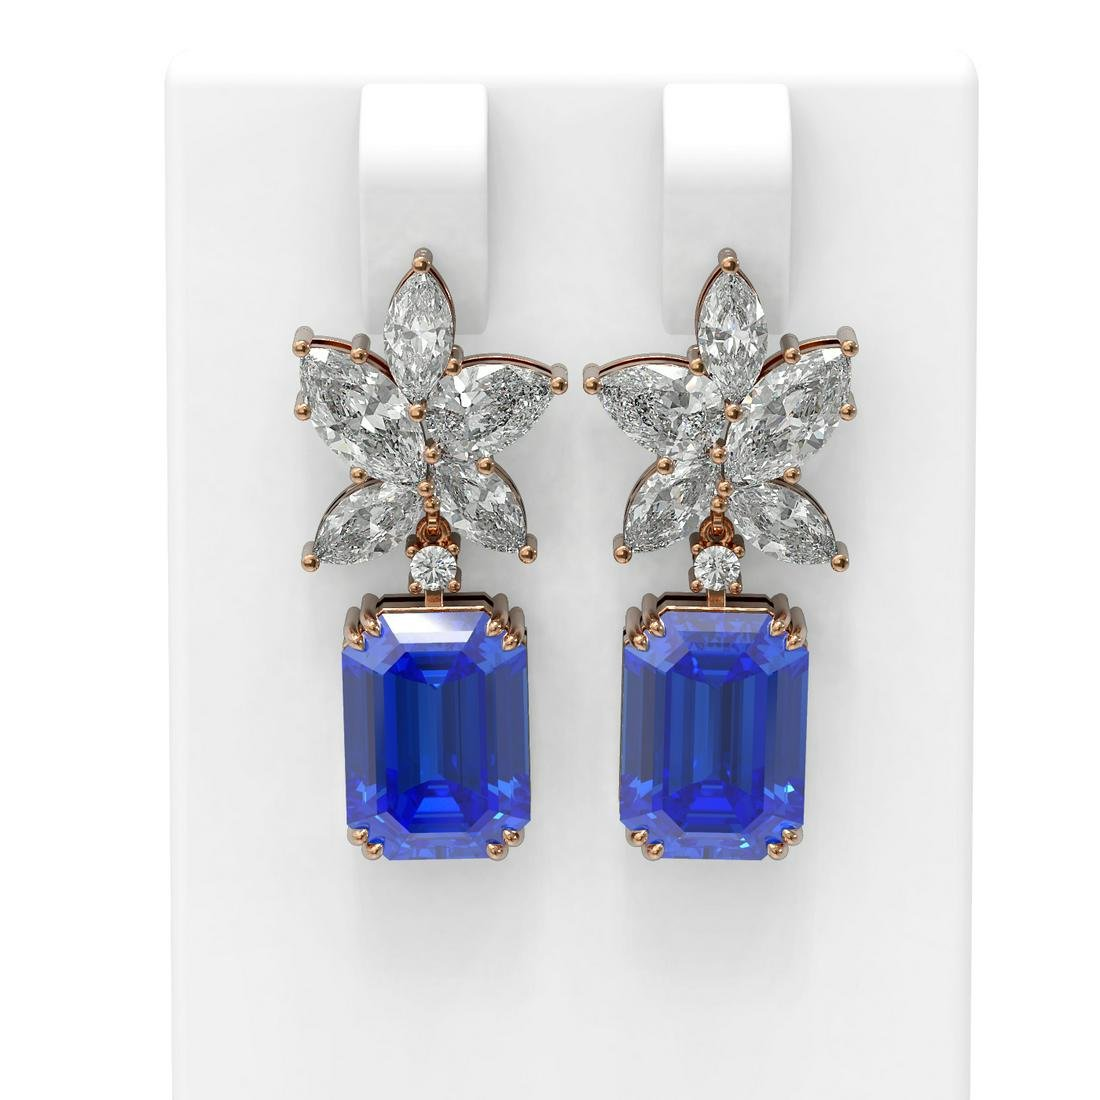 12.69 ctw Tanzanite & Diamond Earrings 18K Rose Gold -